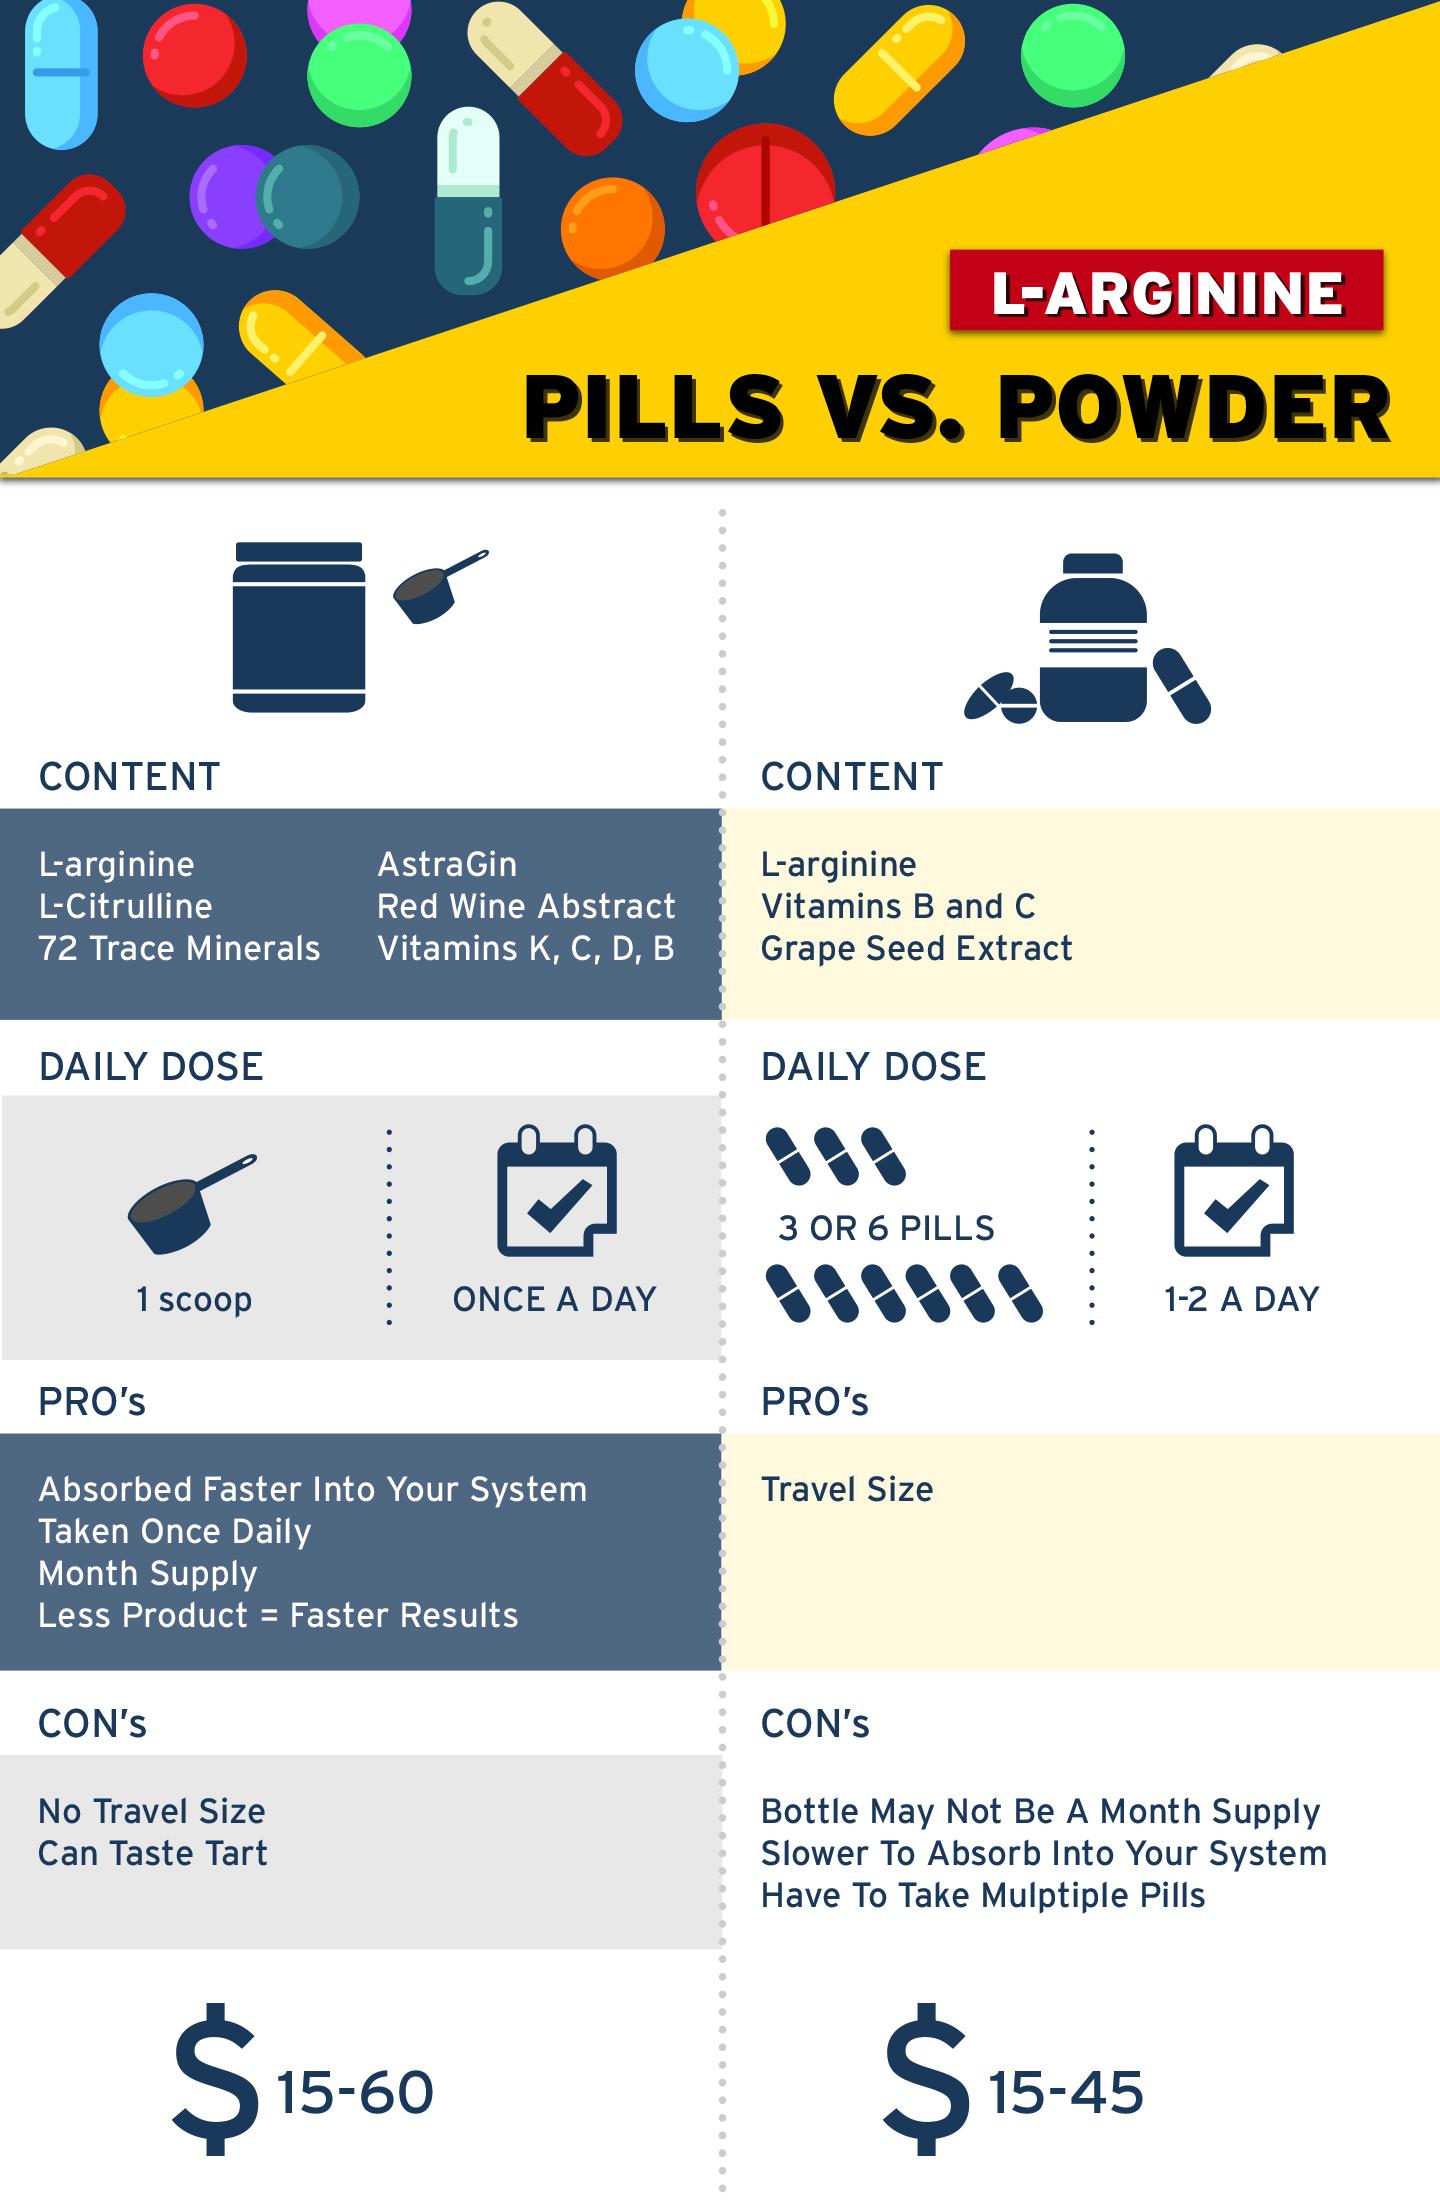 L-Arginine Powder vs. Pill Supplements